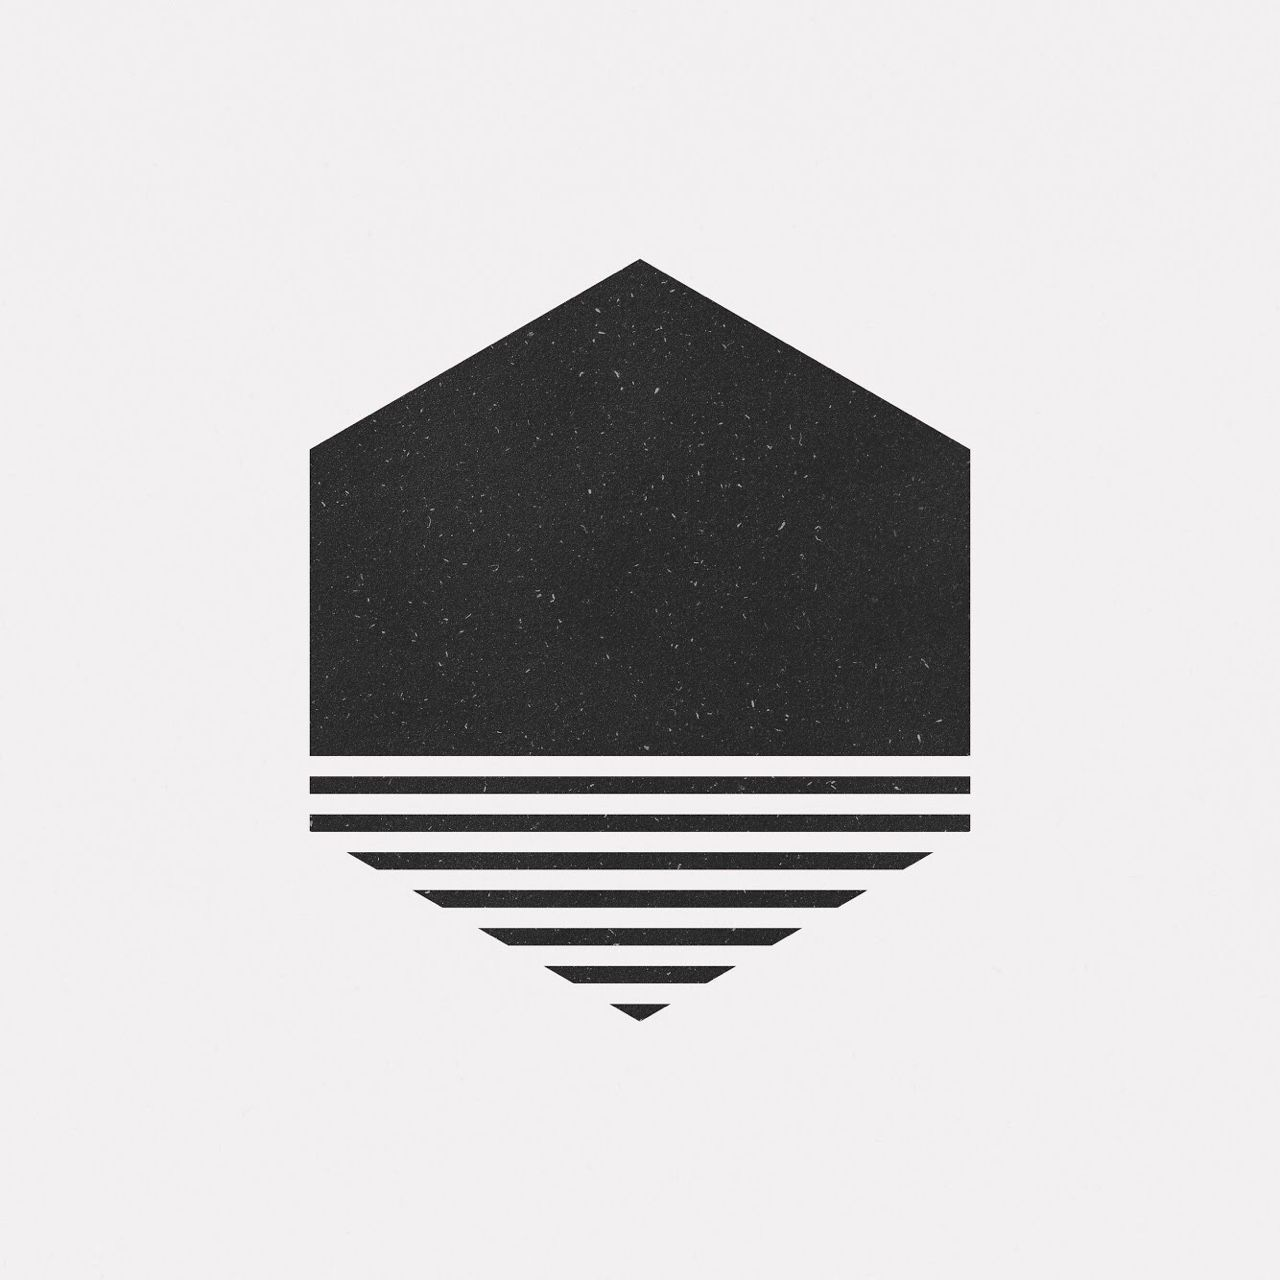 Dailyminimal au15 313 a new geometric design every day for Art minimal livre